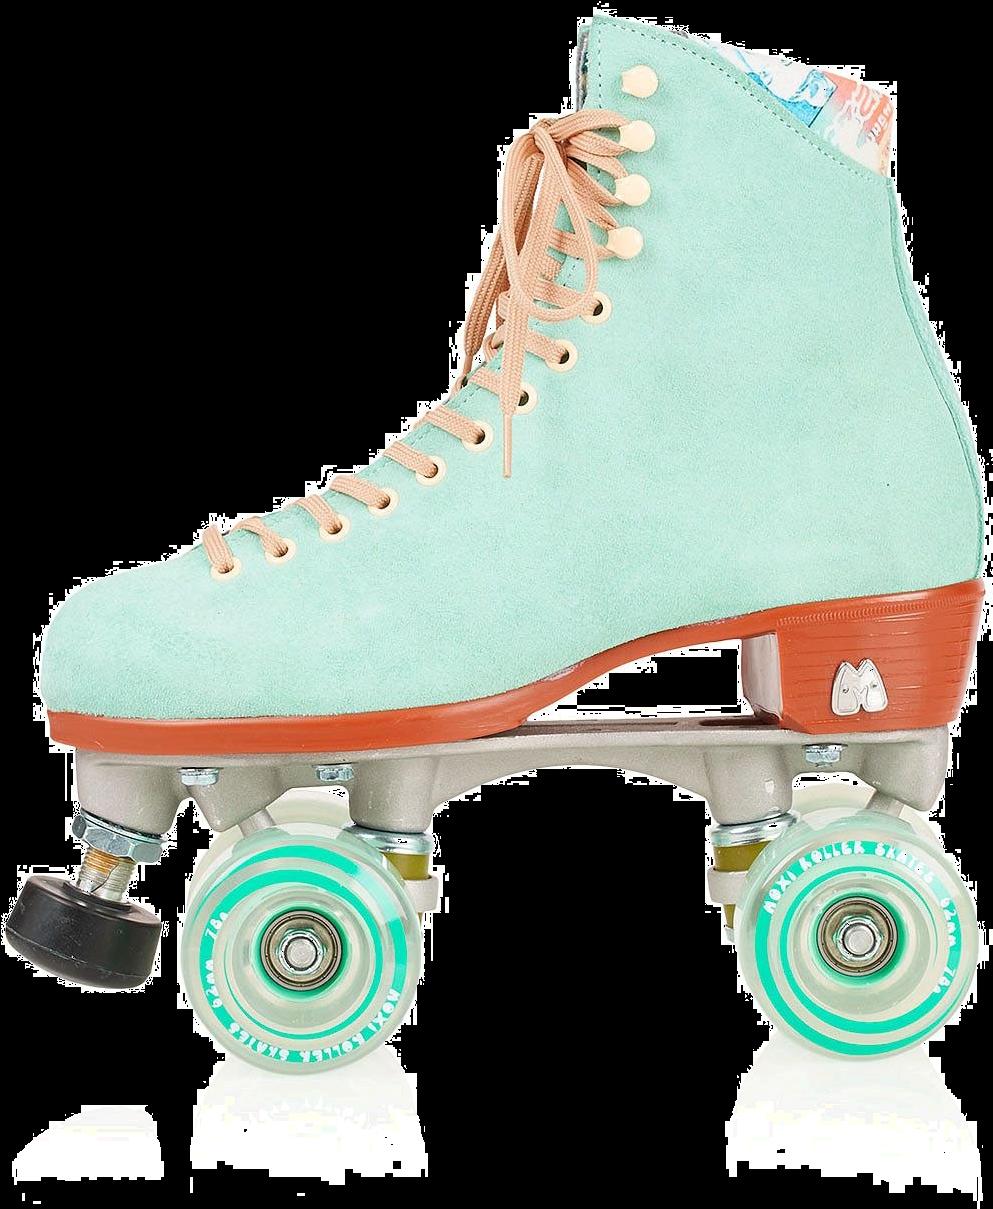 Transparent roller skate silhouette clip art - Artistic Roller Skating - Pastel Retro Roller Skates